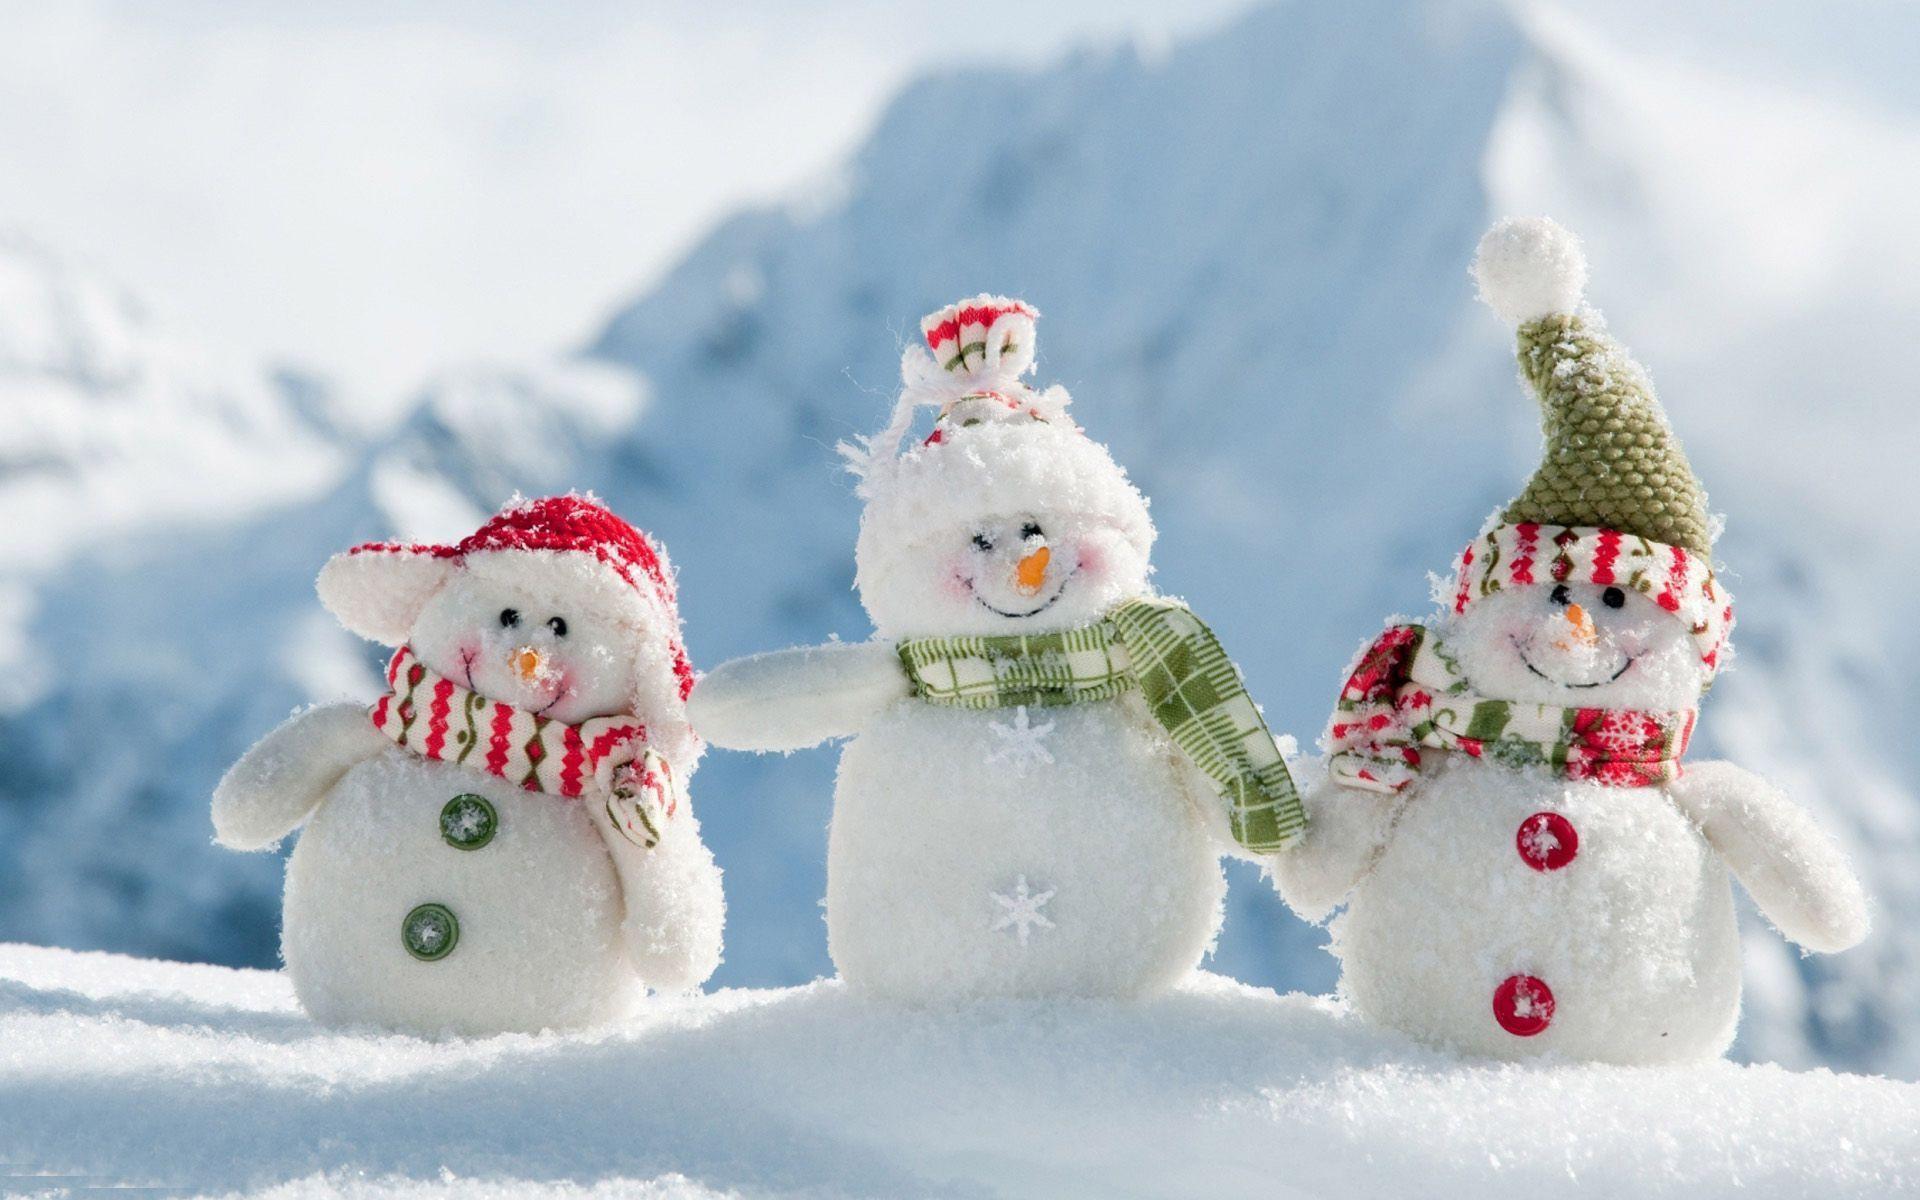 Cute Snowman Wallpapers  Wallpaper Cave